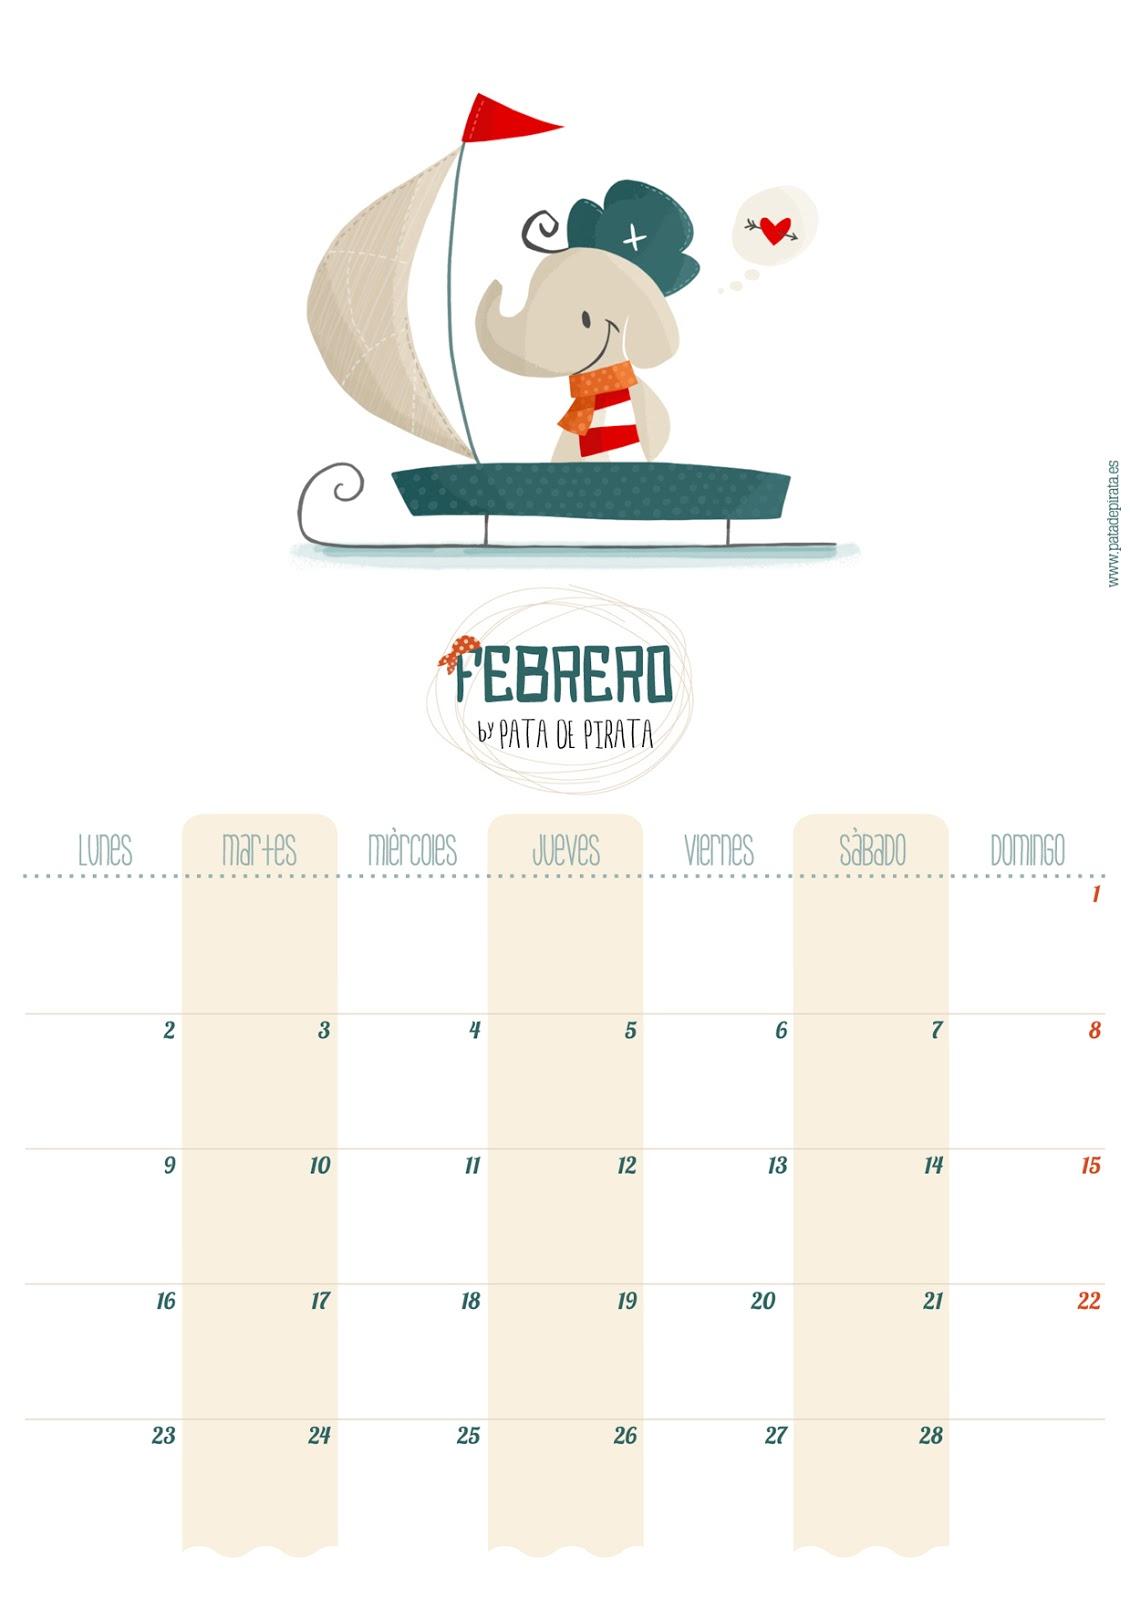 Aries Febrero 2 A Febrero 8 2015 Pin Forecast Funny